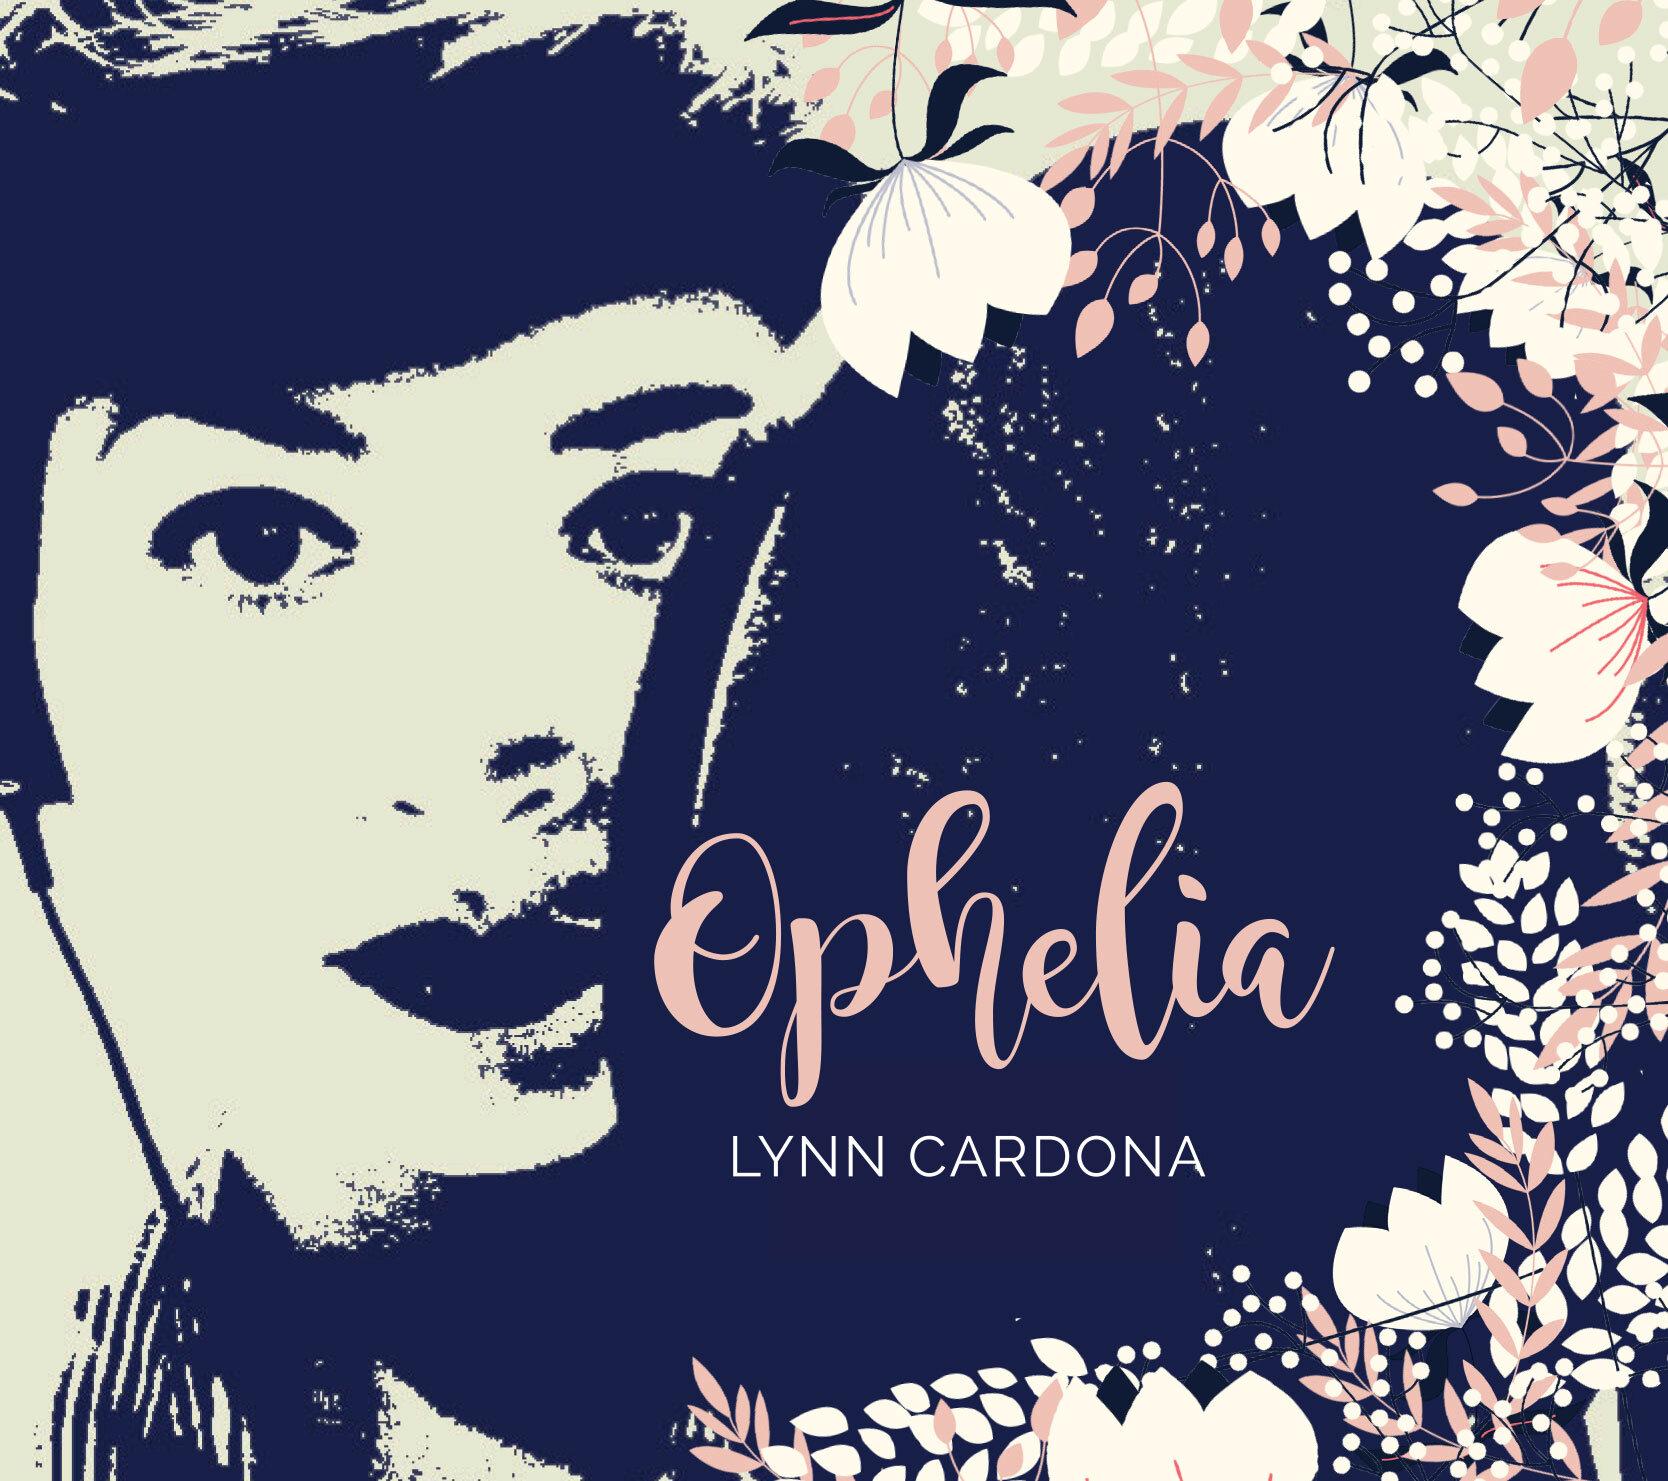 Lynn Cardona - OpheliaLynn Cardona - VocalsJosh Nelson - Acoustic and Electric PianoNozomi Yamaguchi - Guitar (track 1 & 2)Michael Hunter - Flugelhorn (track 3)Dae Robaire - Upright & Electric BassDan Schnelle - Drums